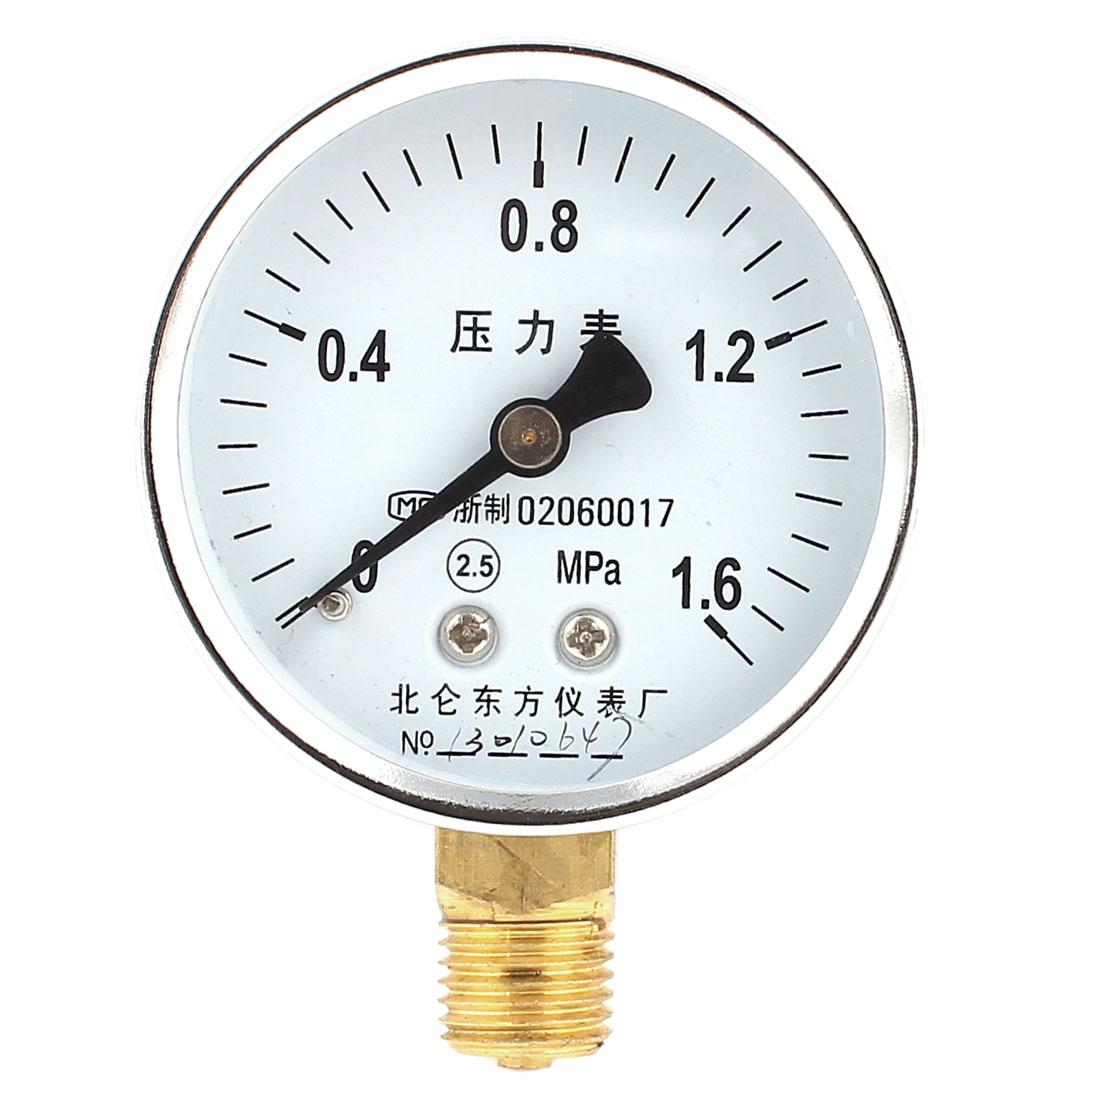 60mm Dial 1/4PT Thread 2.5 Precision Class 0-1.6Mpa Pressure Gauge